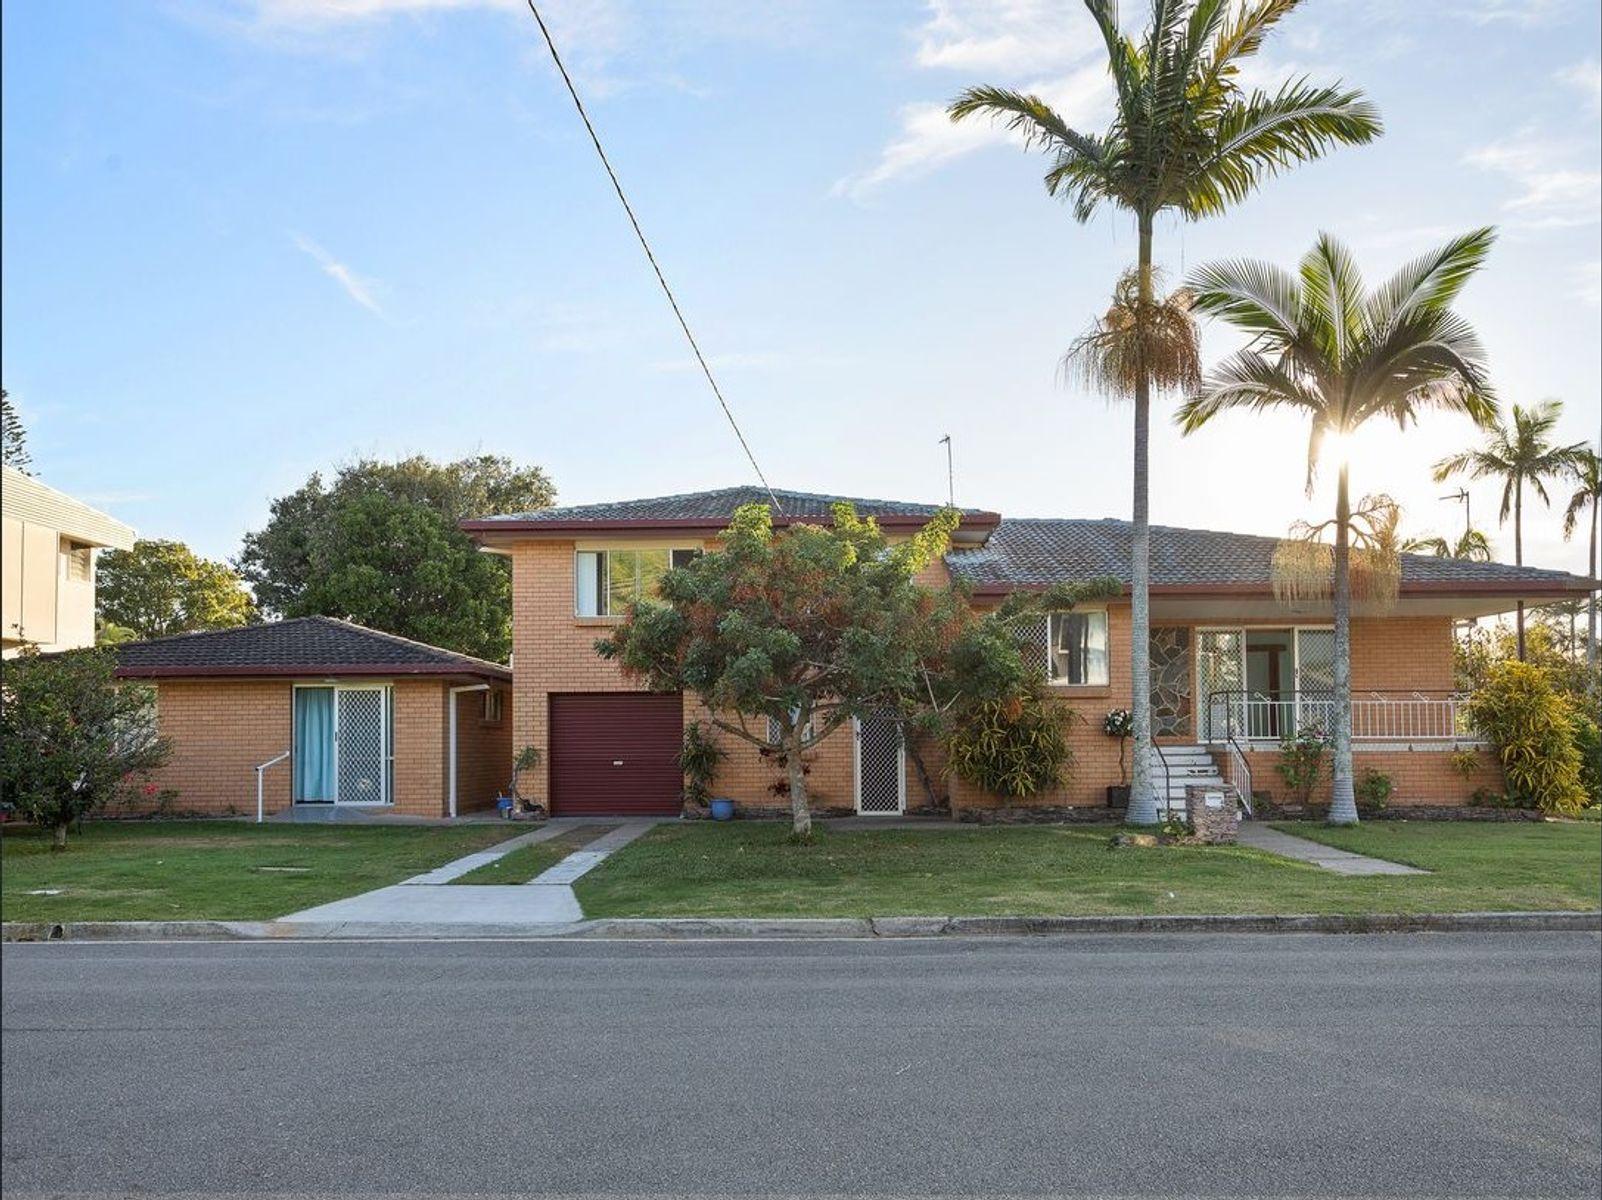 4B Tuesley Court, Southport, QLD 4215